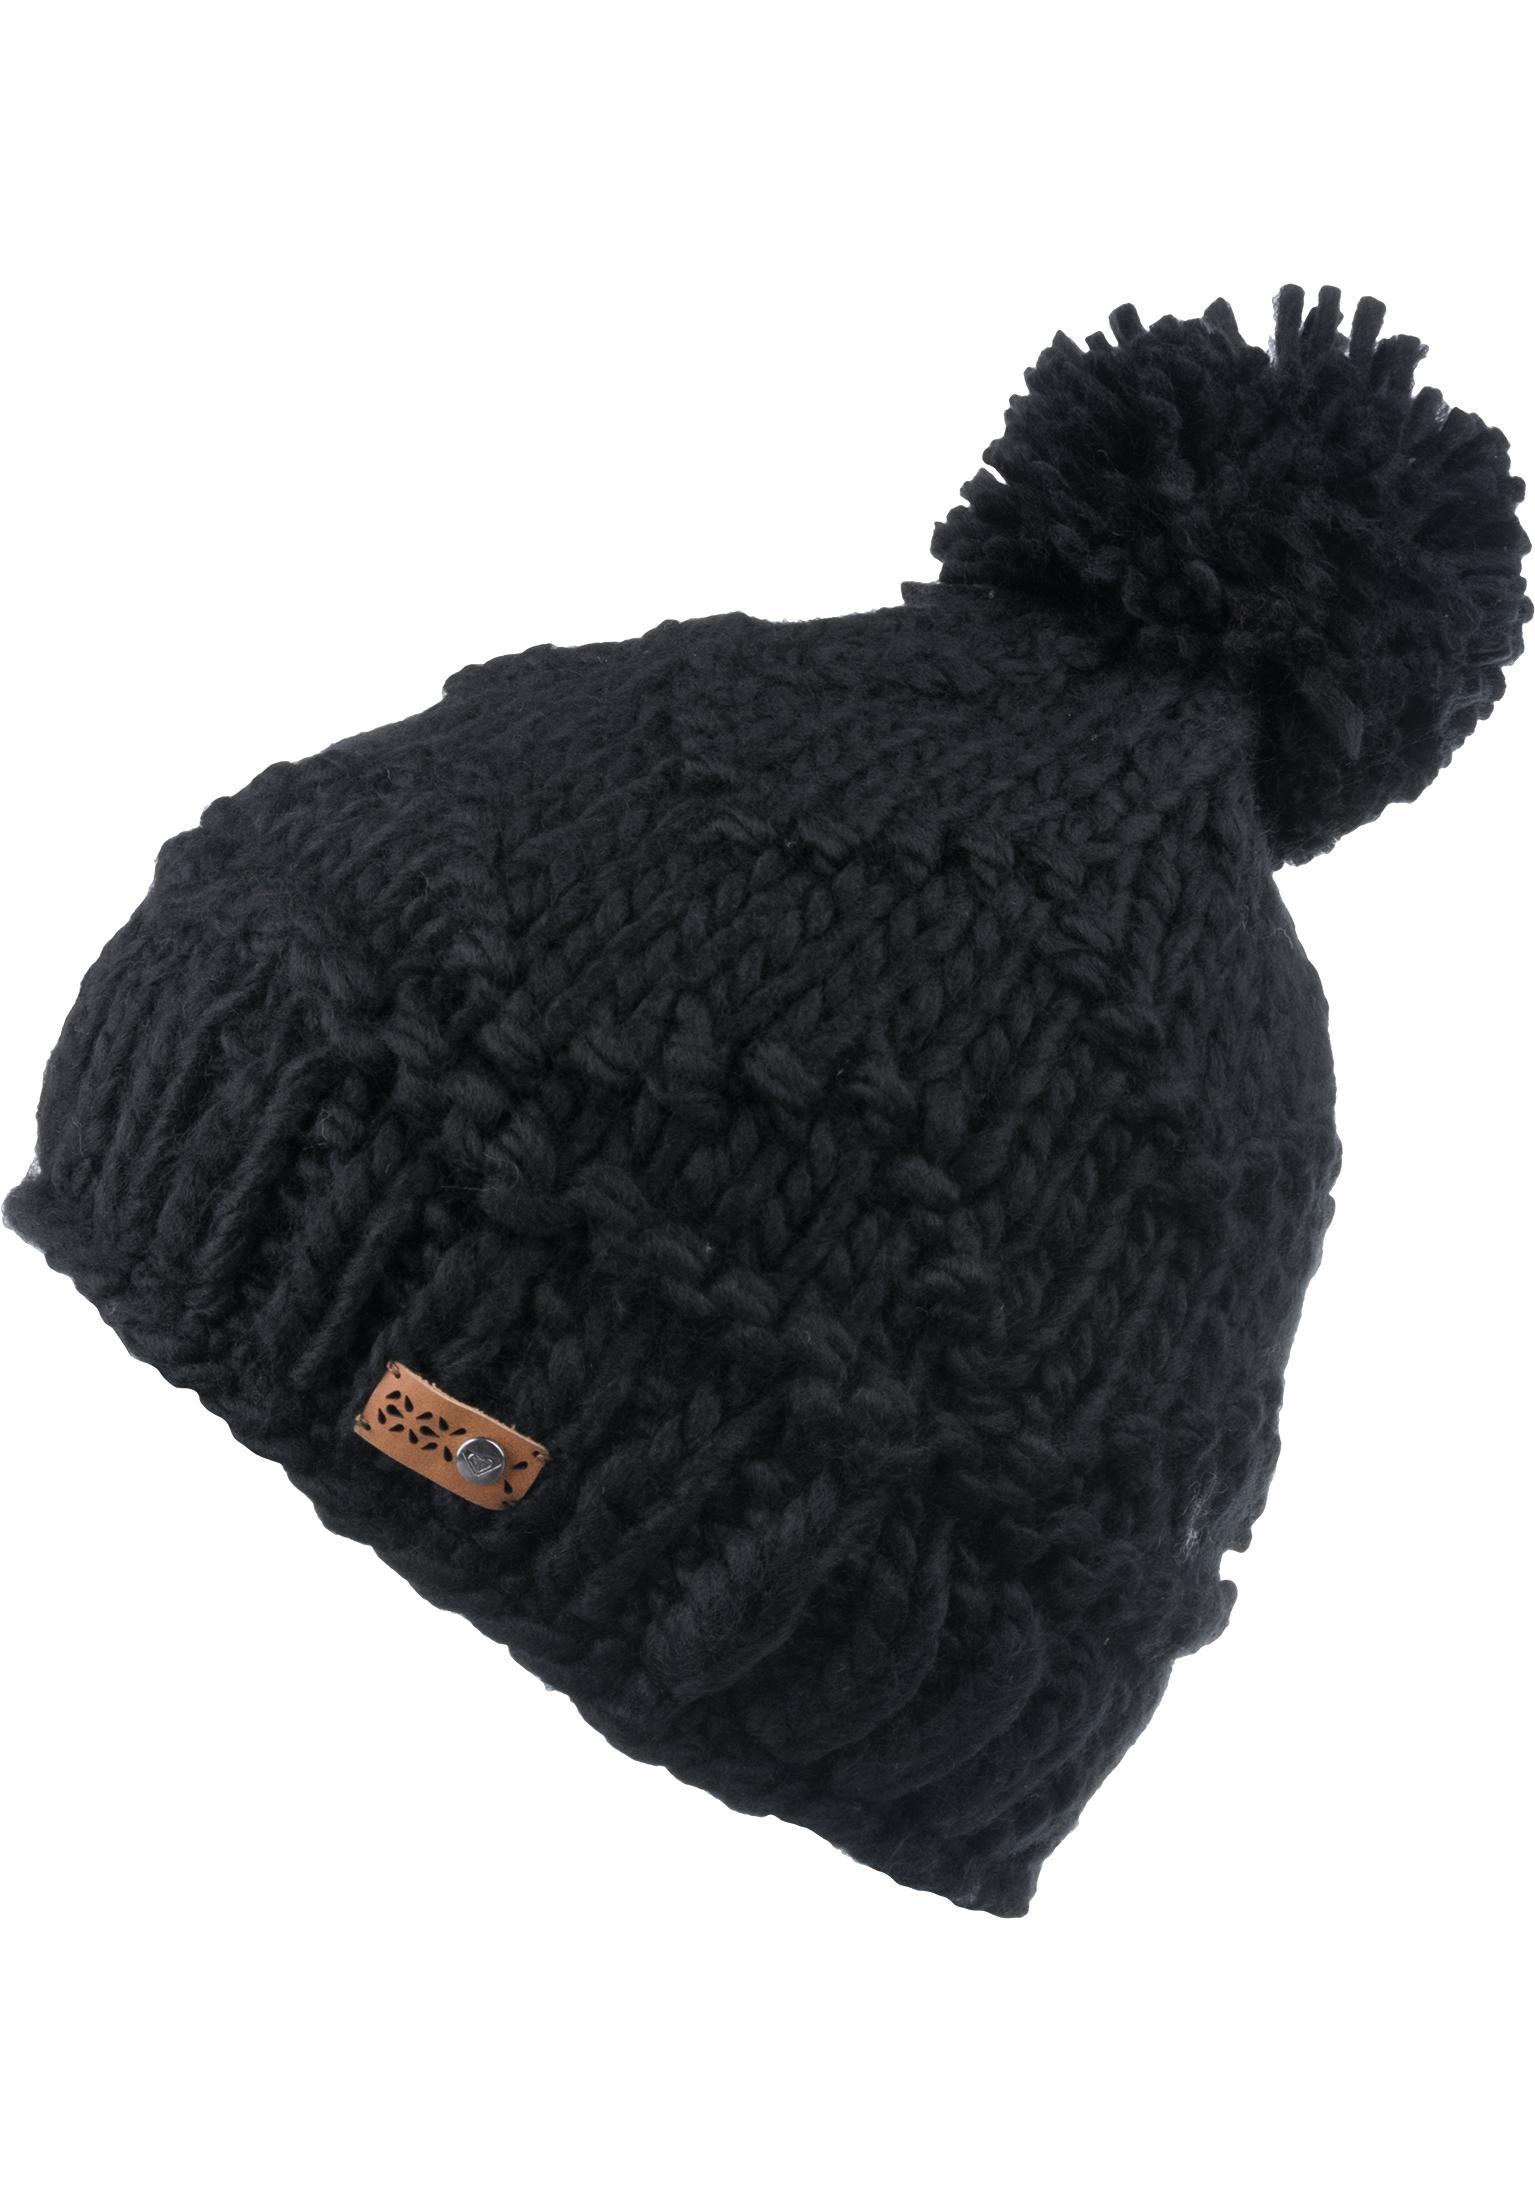 8ee95878cc541 Winter Roxy Beanies in trueblack for Men